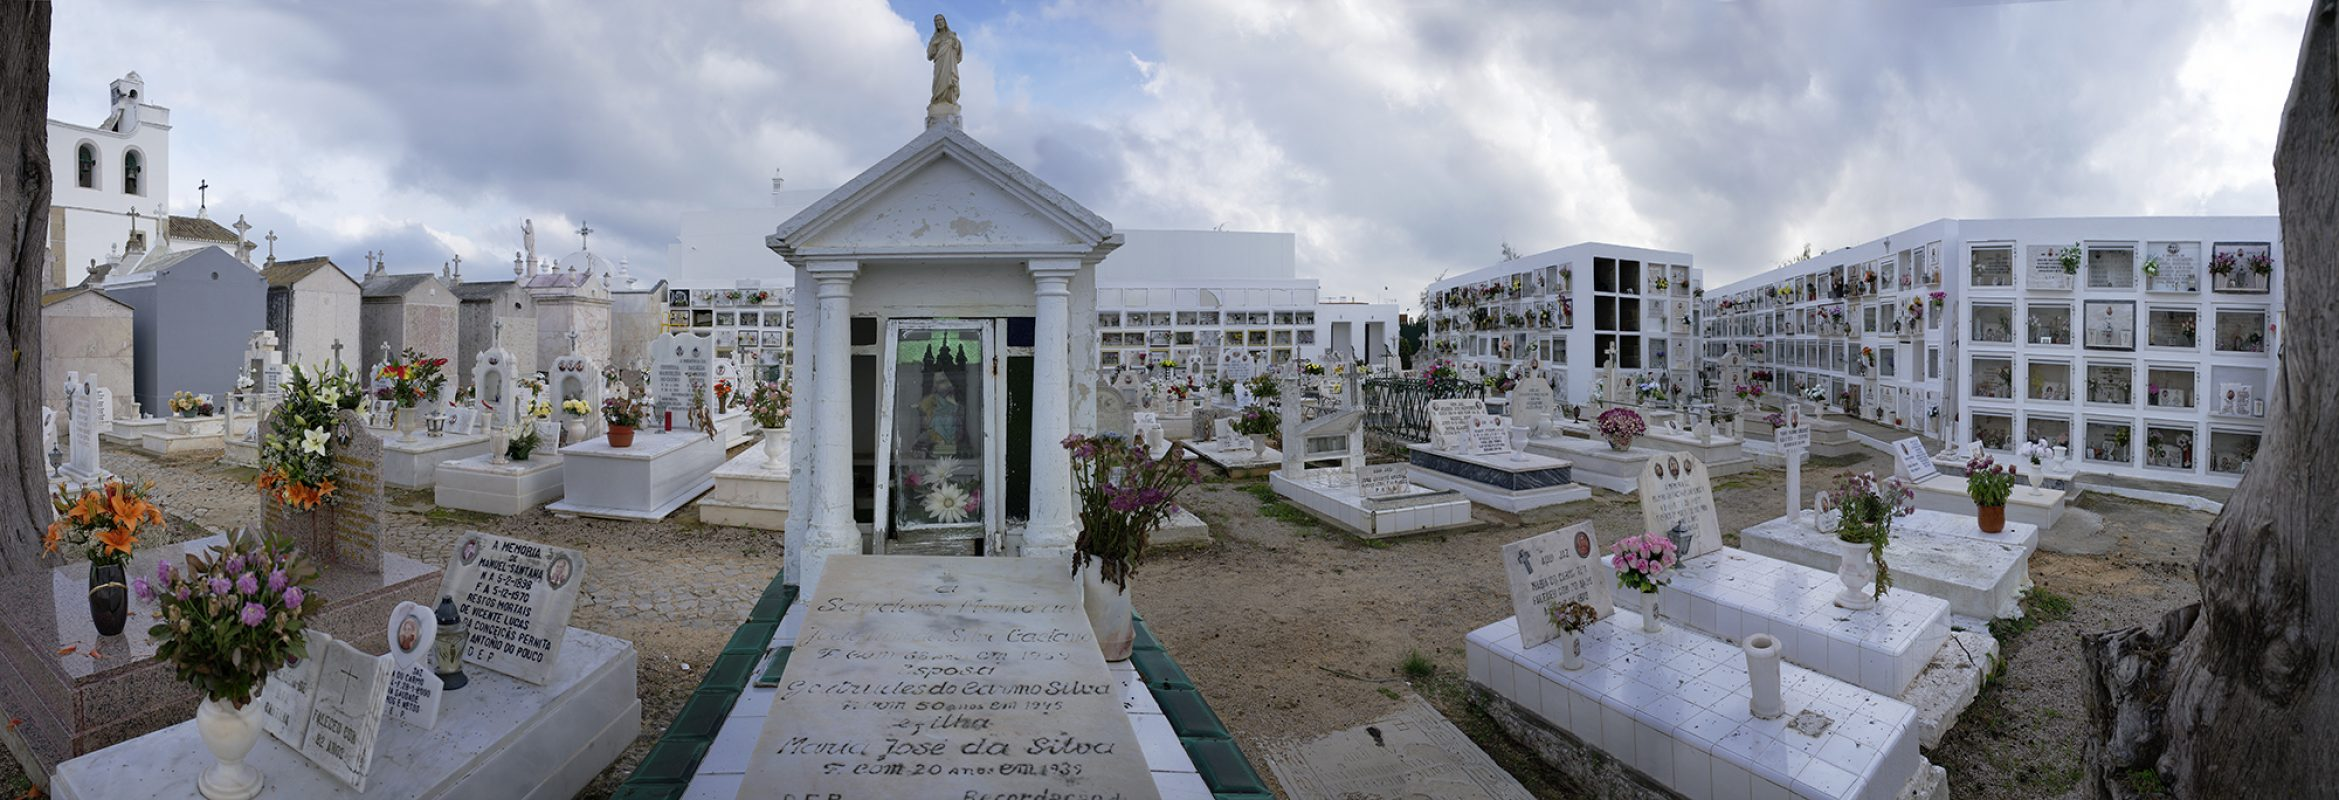 Portugal, Fuseta, Friedhof